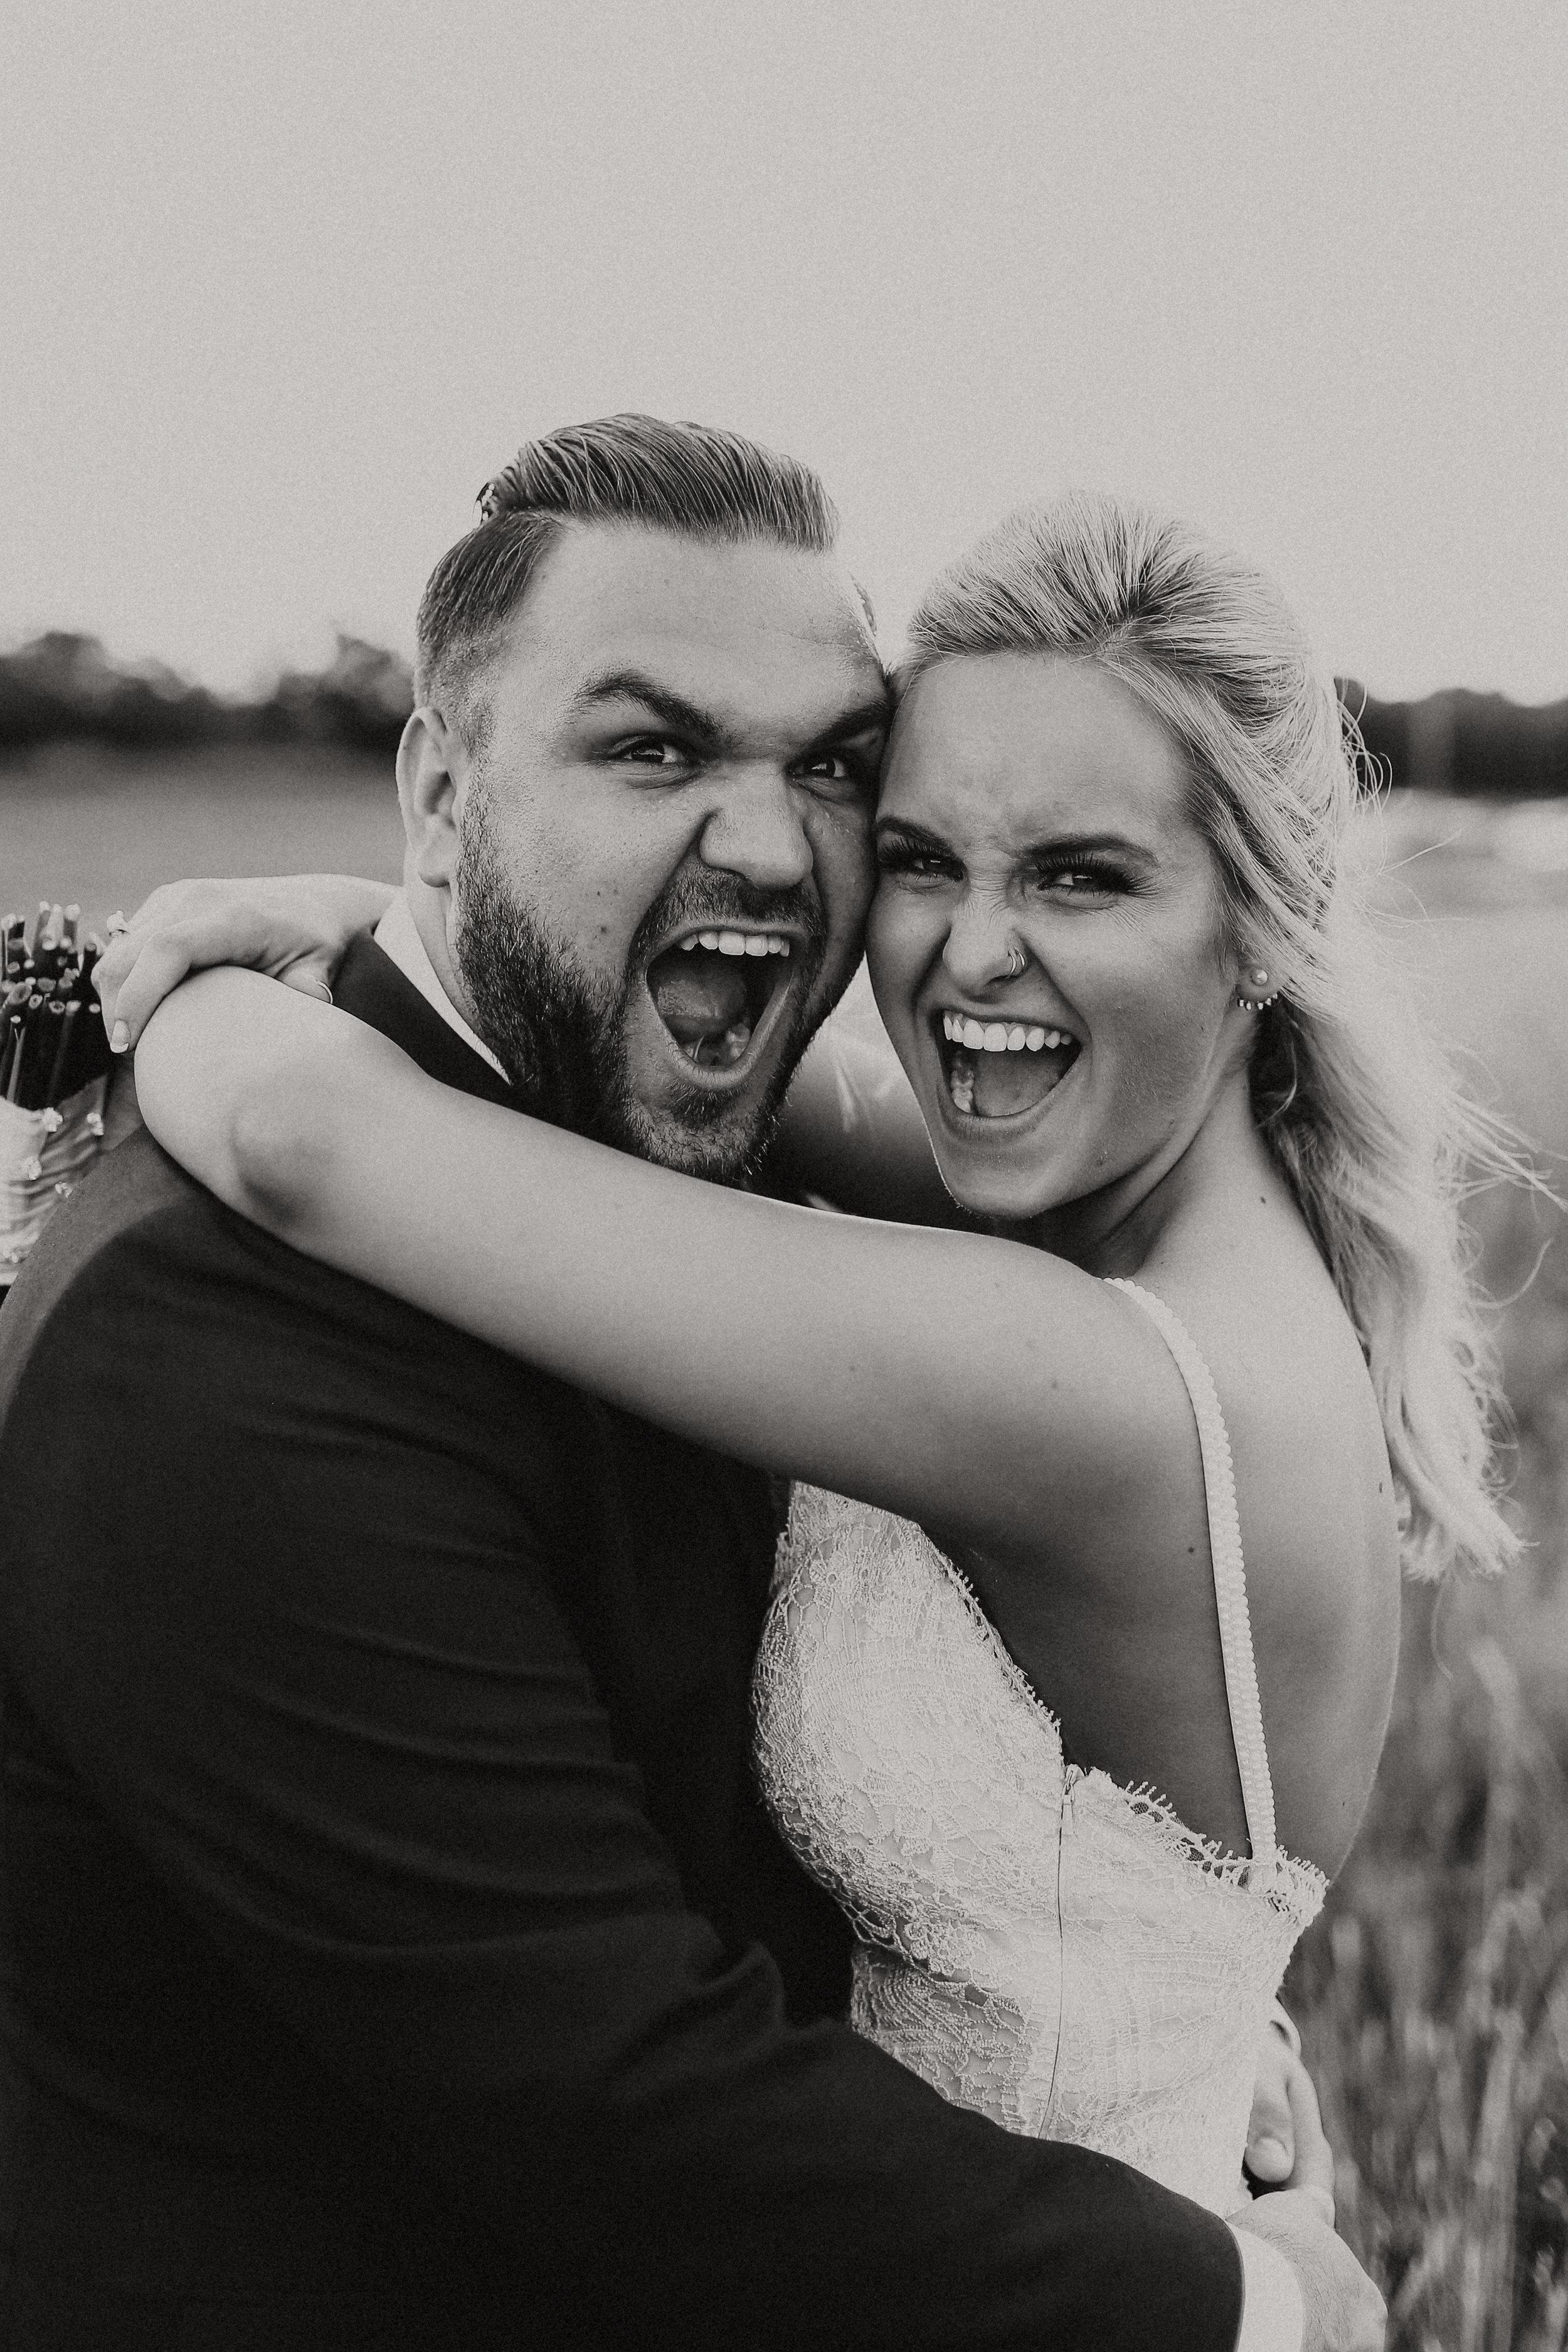 Backyard_Wedding_Oklahoma_MelissaMarshall_30.jpg